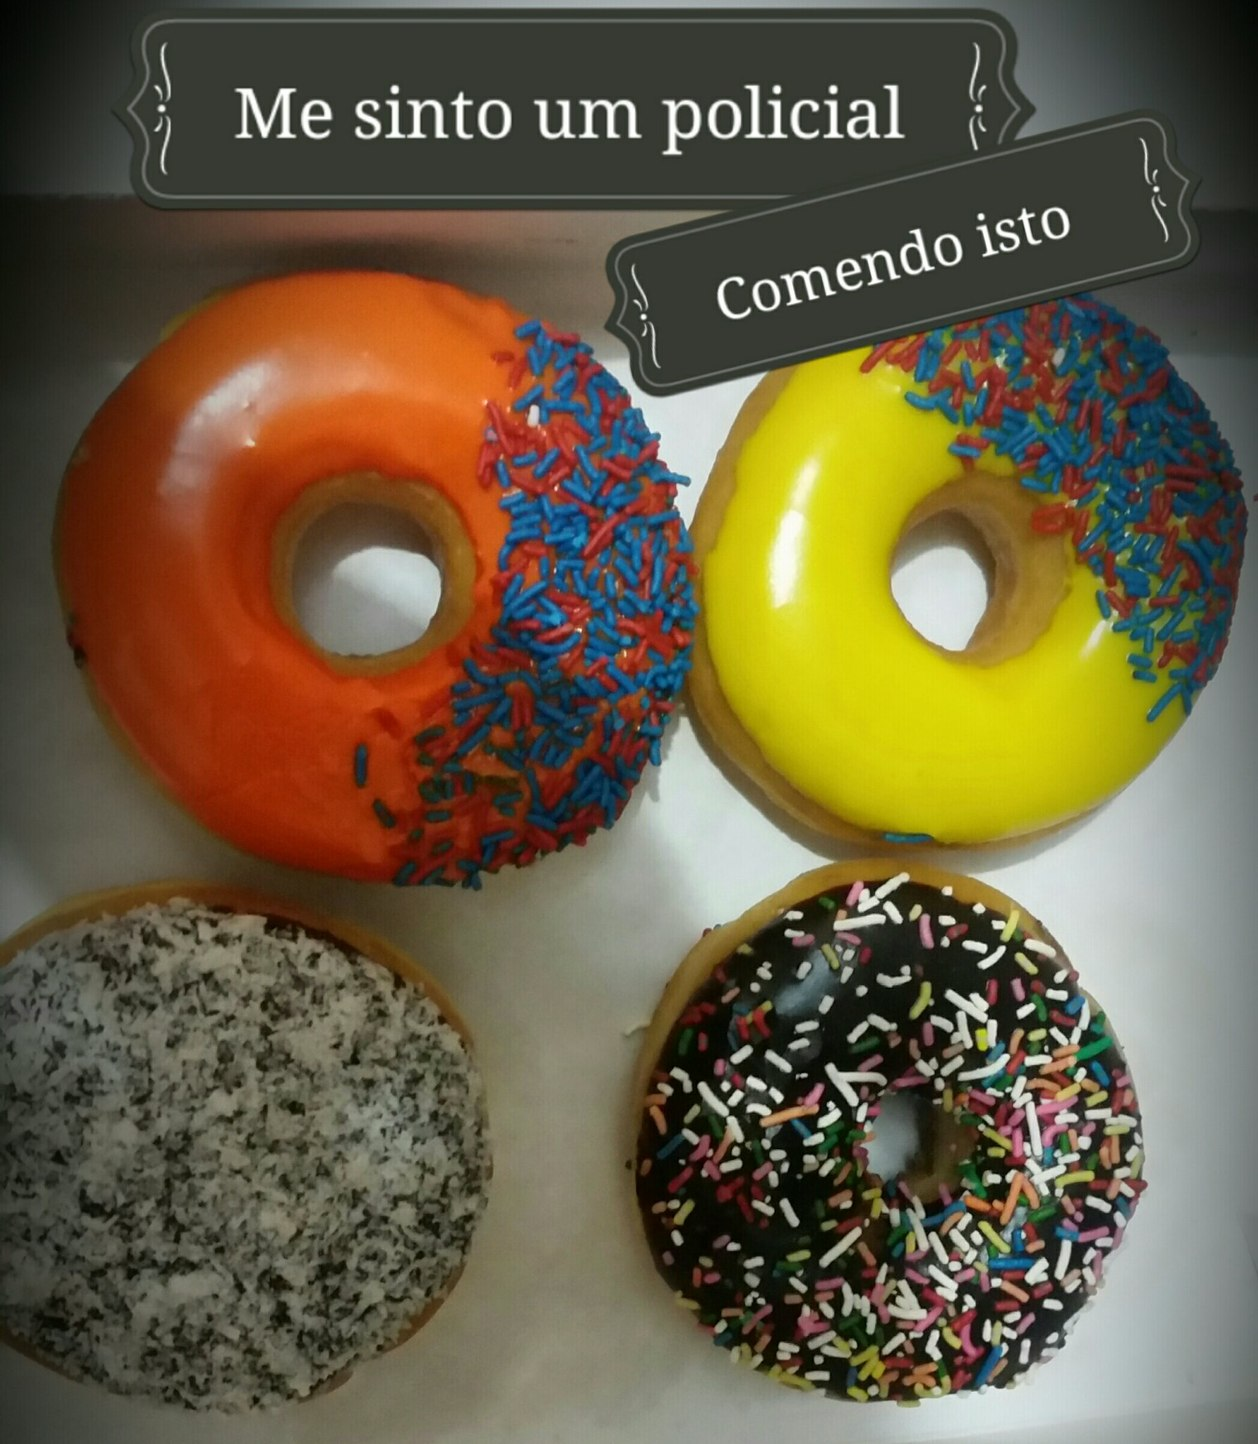 Policia - meme